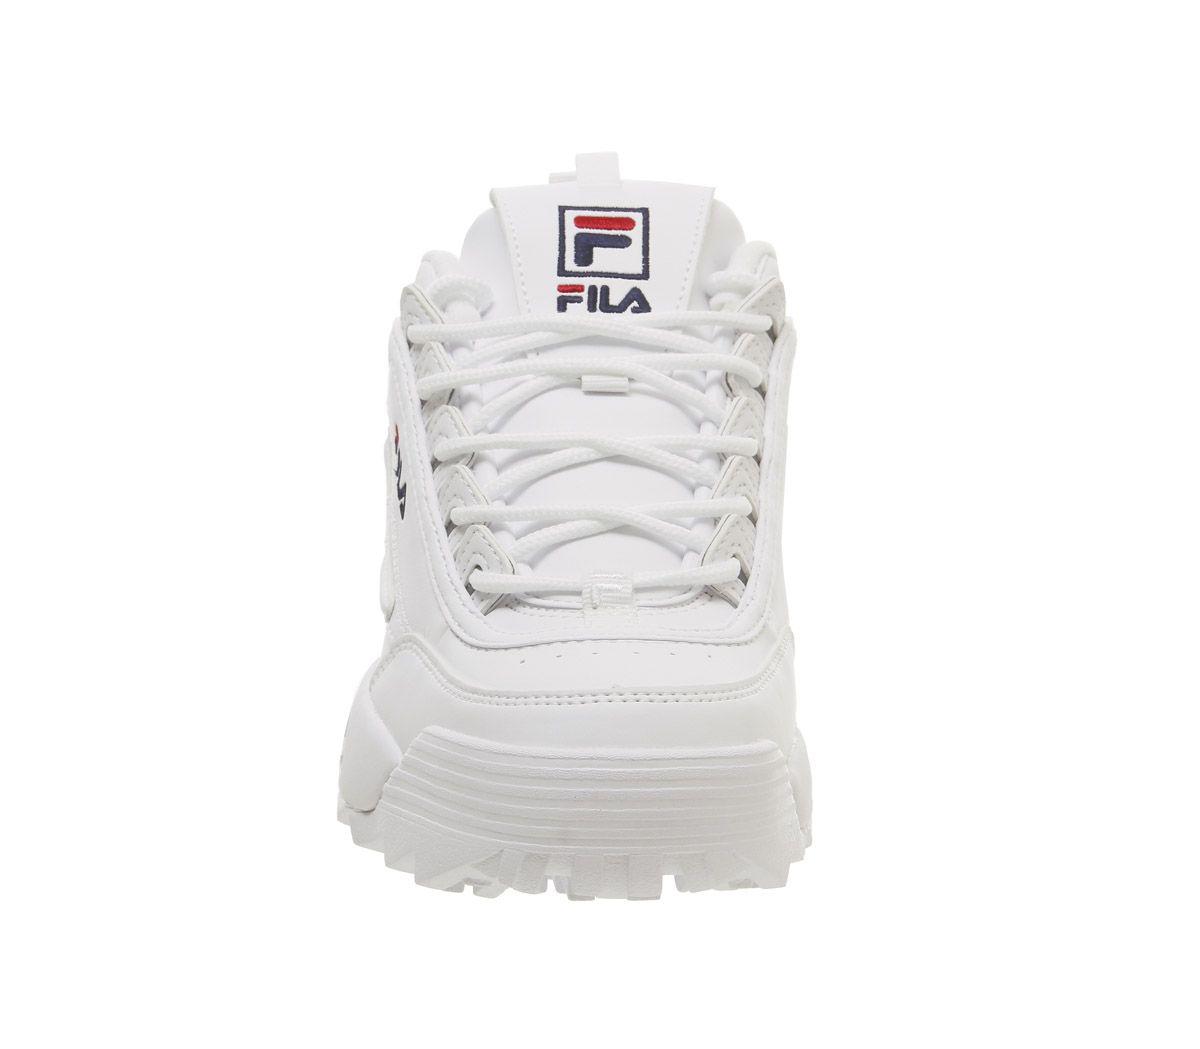 181ad0b0c5d5 Donna Fila Disruptor II Scarpe Bianco pelle G Scarpe | eBay